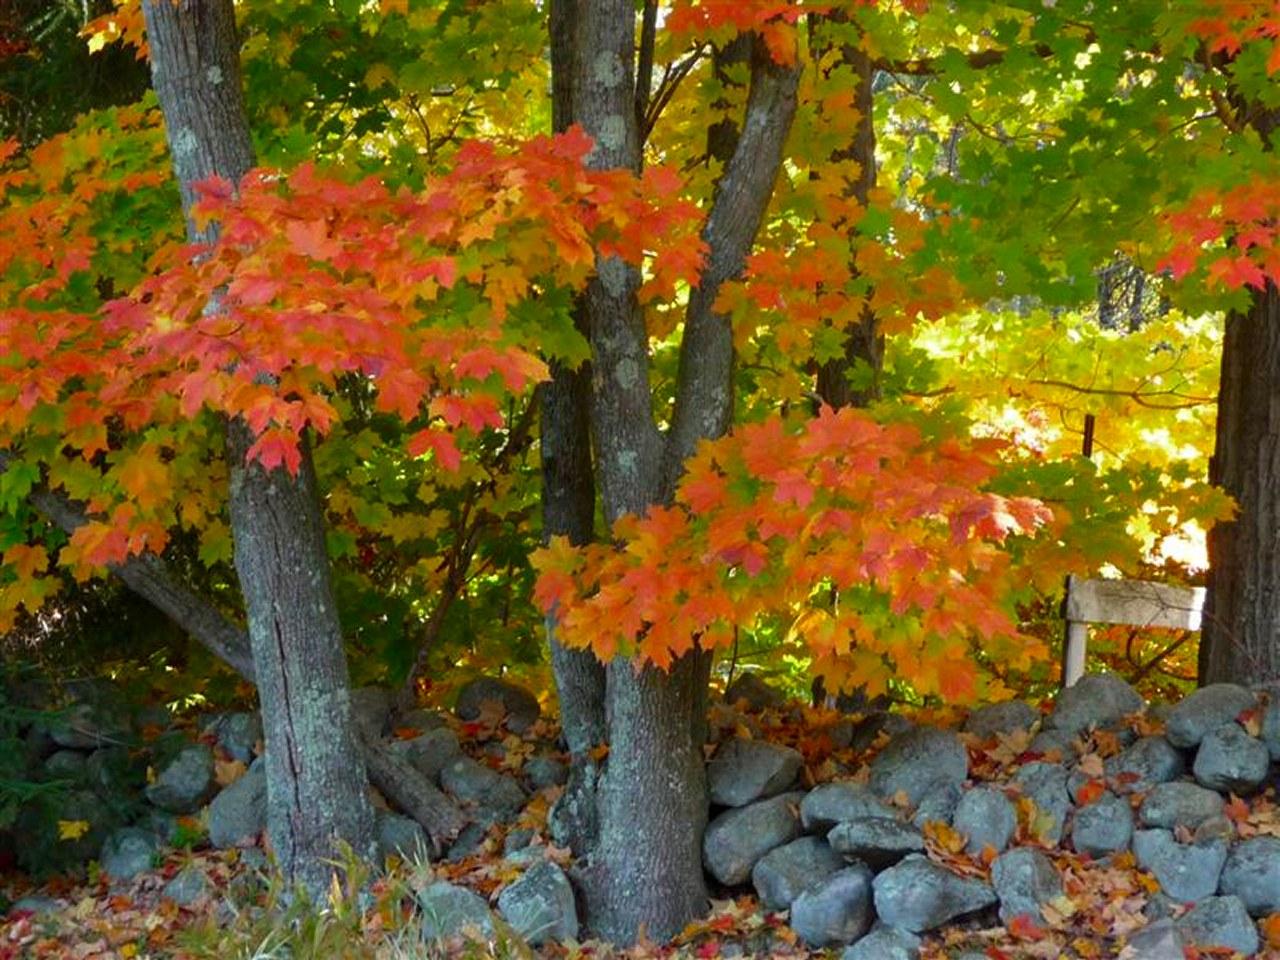 Autumn Scenes Wallpaper   wwwwallpapers in hdcom 1280x960